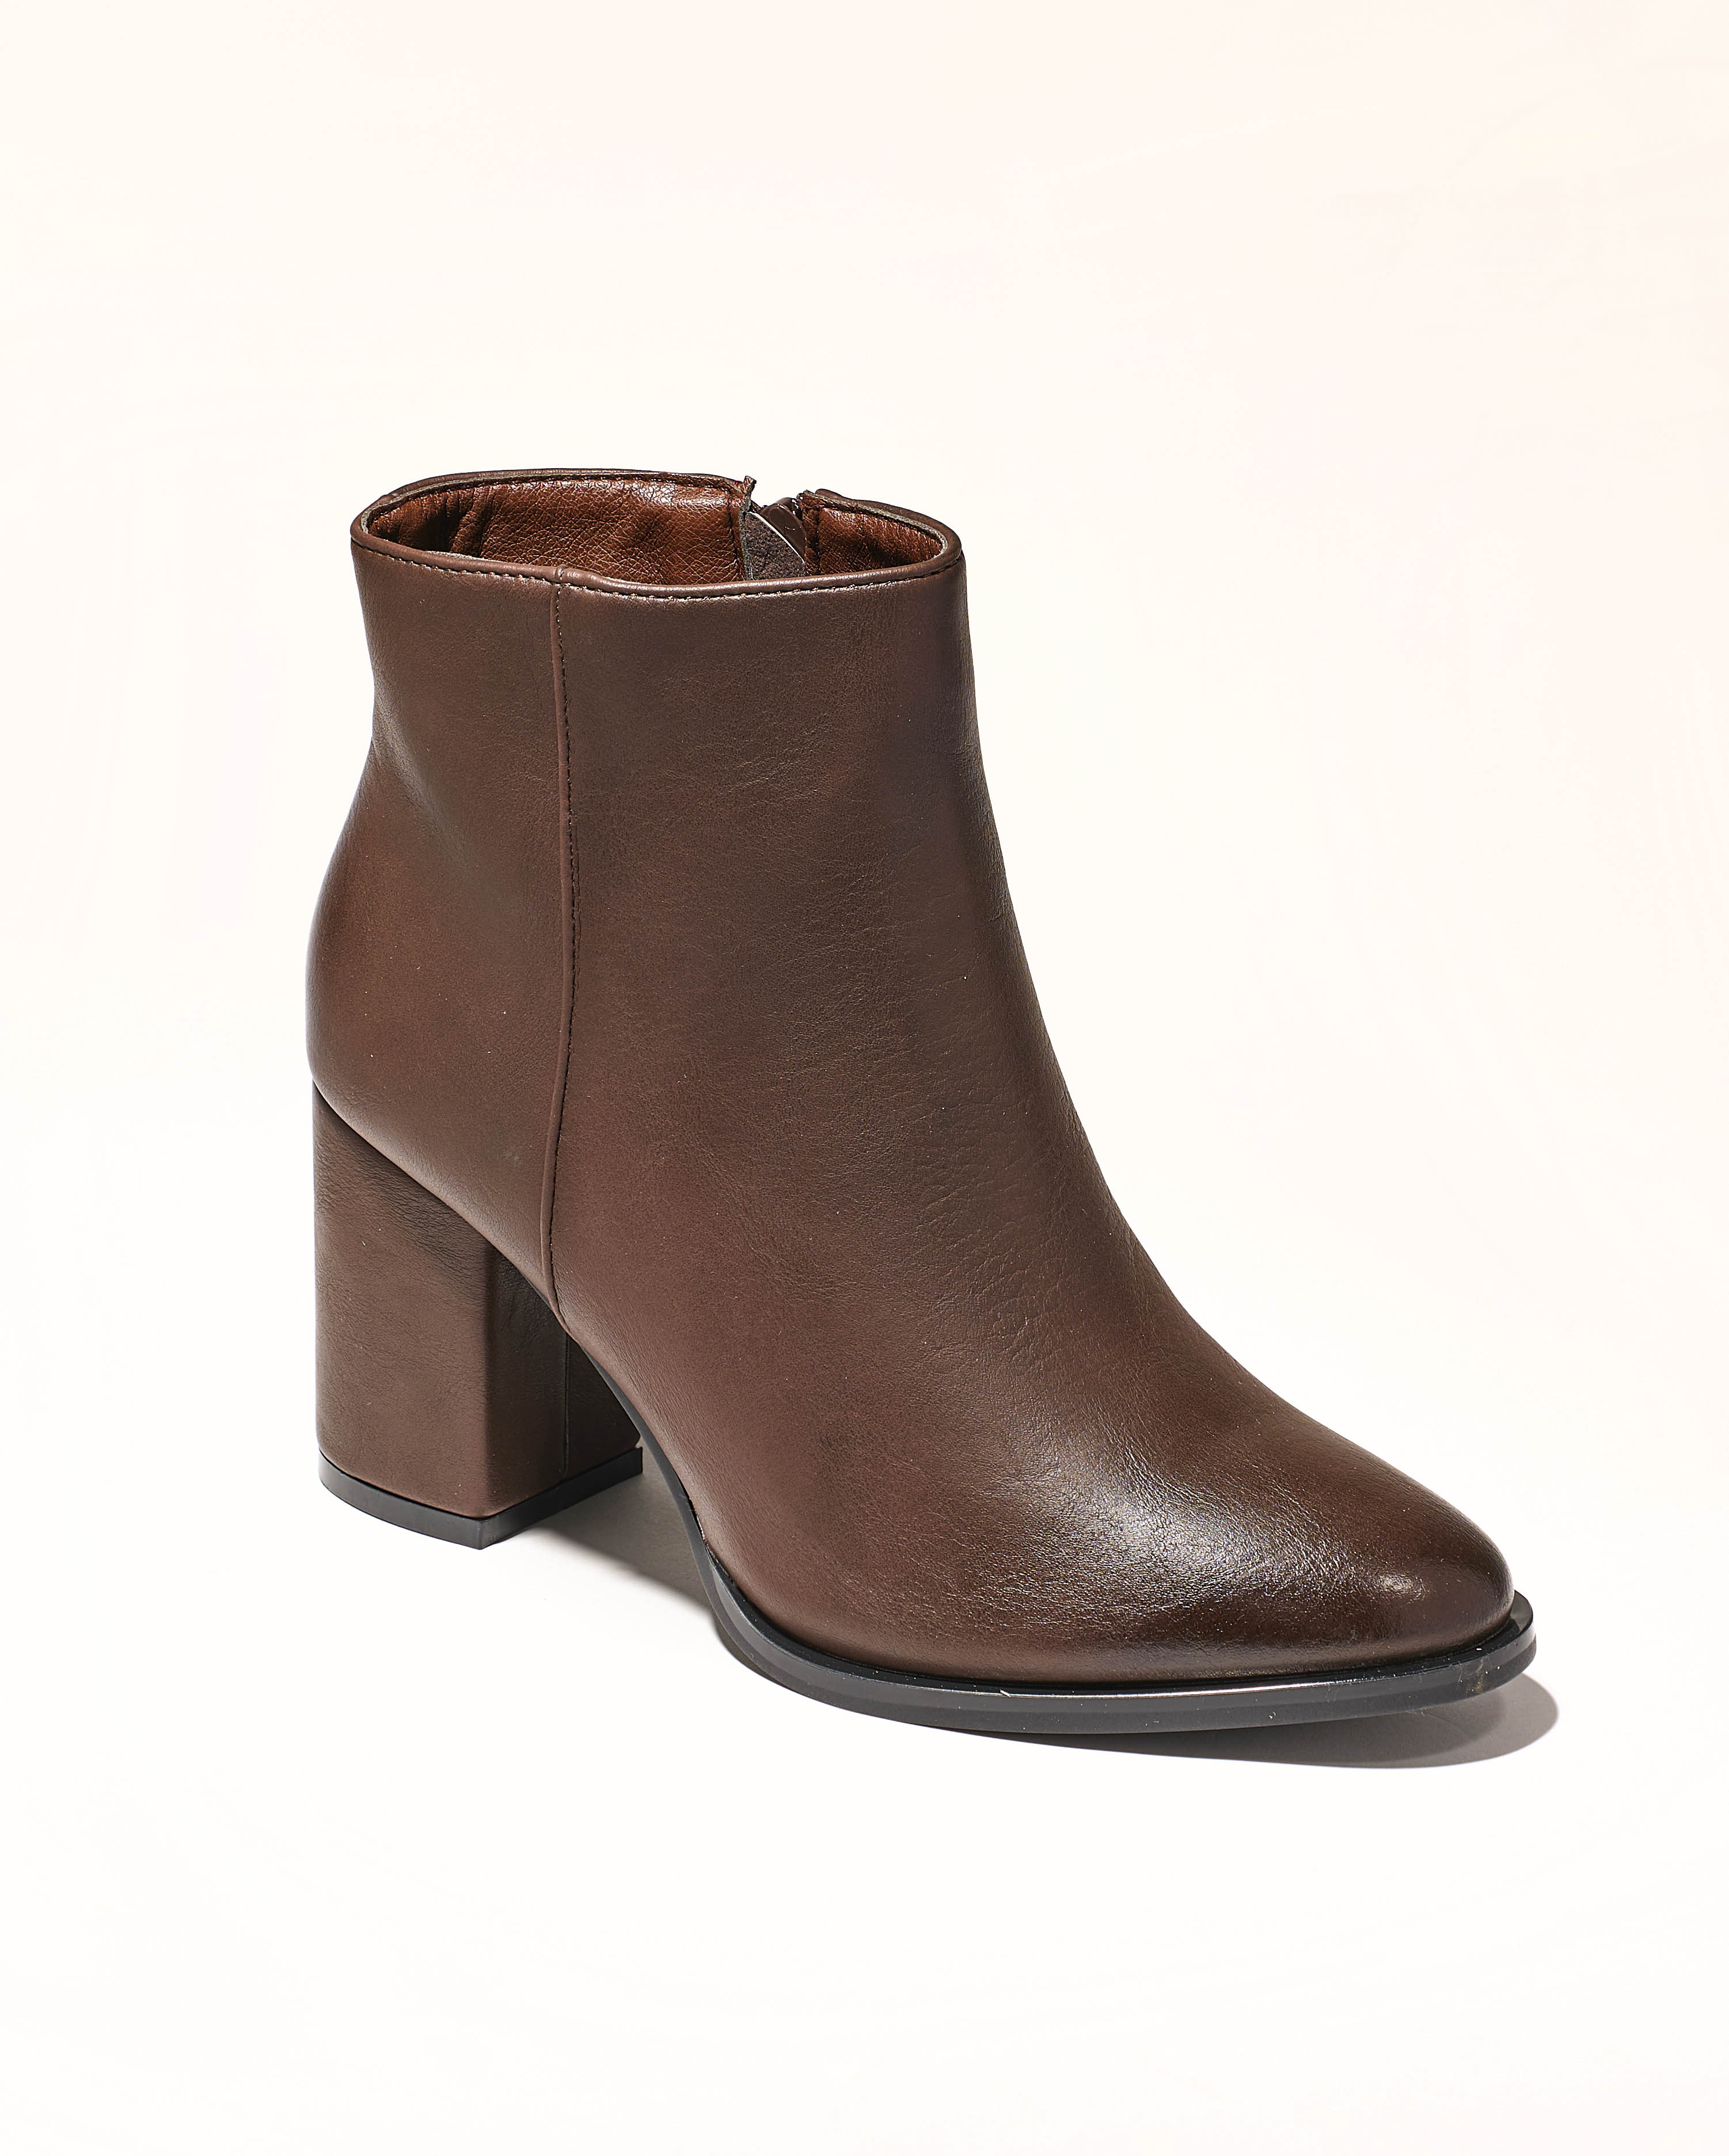 Boots Femme - Boots Marron Jina - 1903